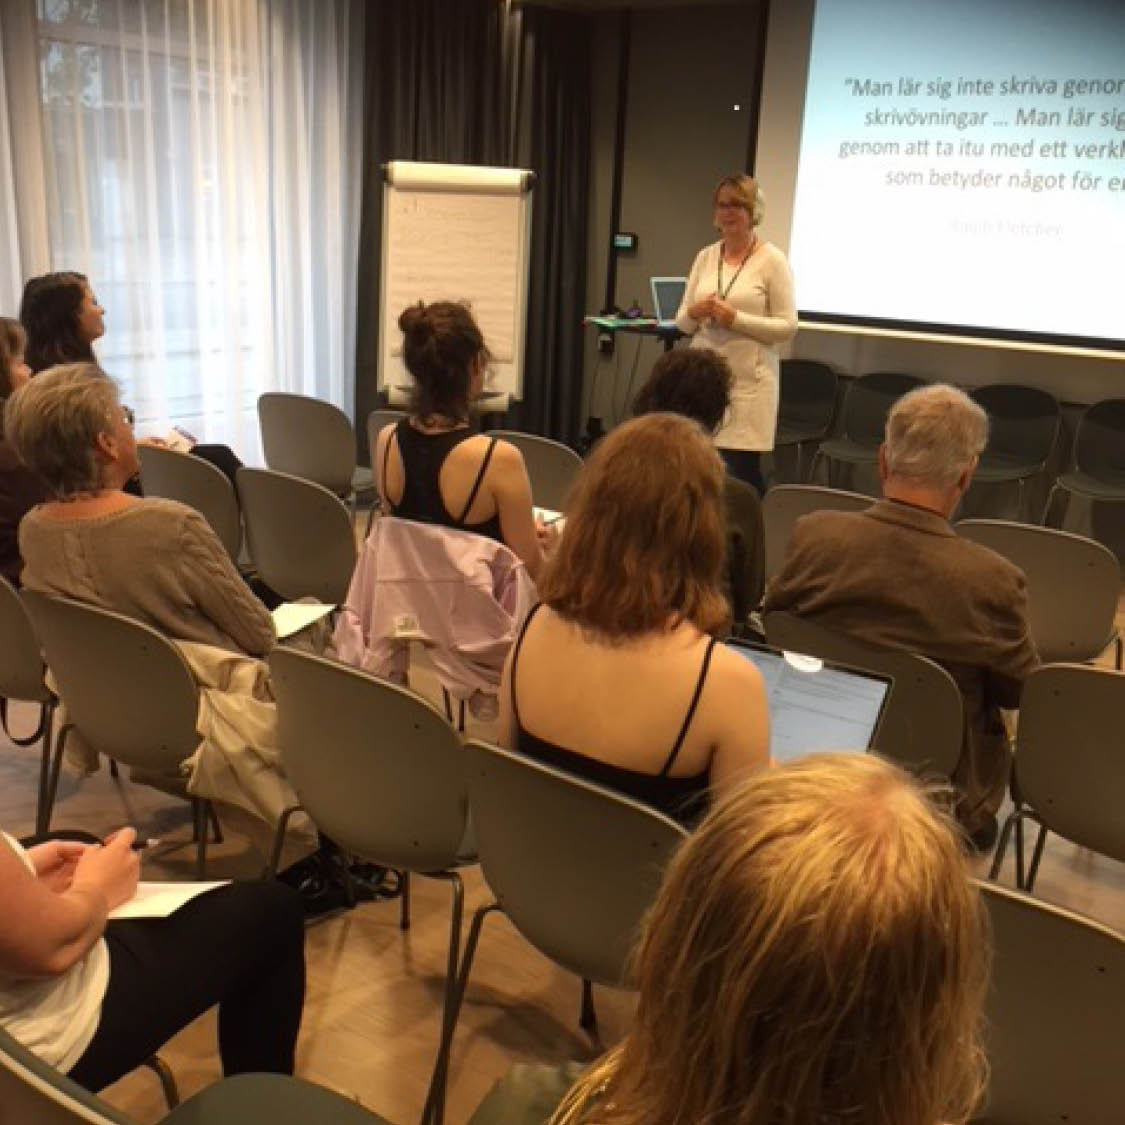 Inger Lundin, Live at heart Literature